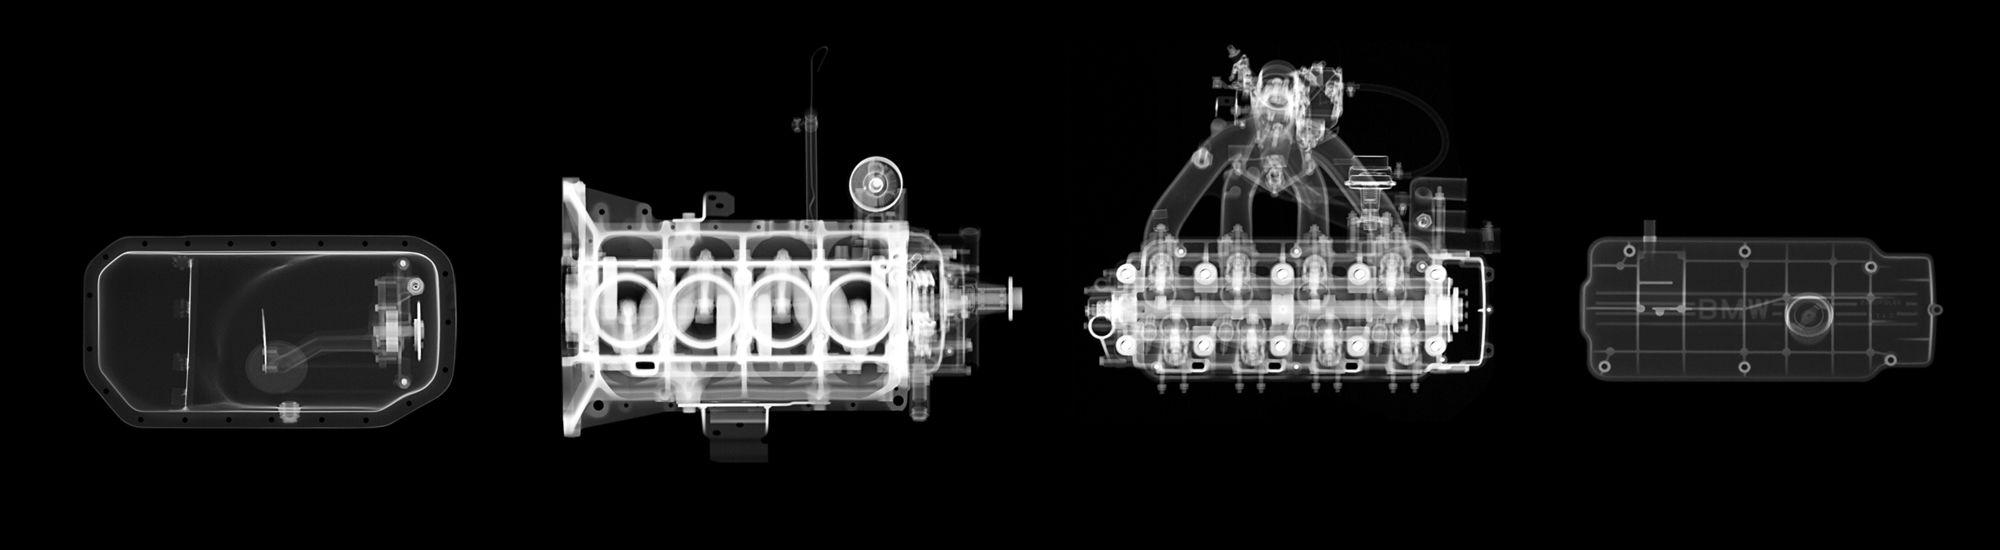 WE! SHOOT IT, BMW M10 x-rayed!